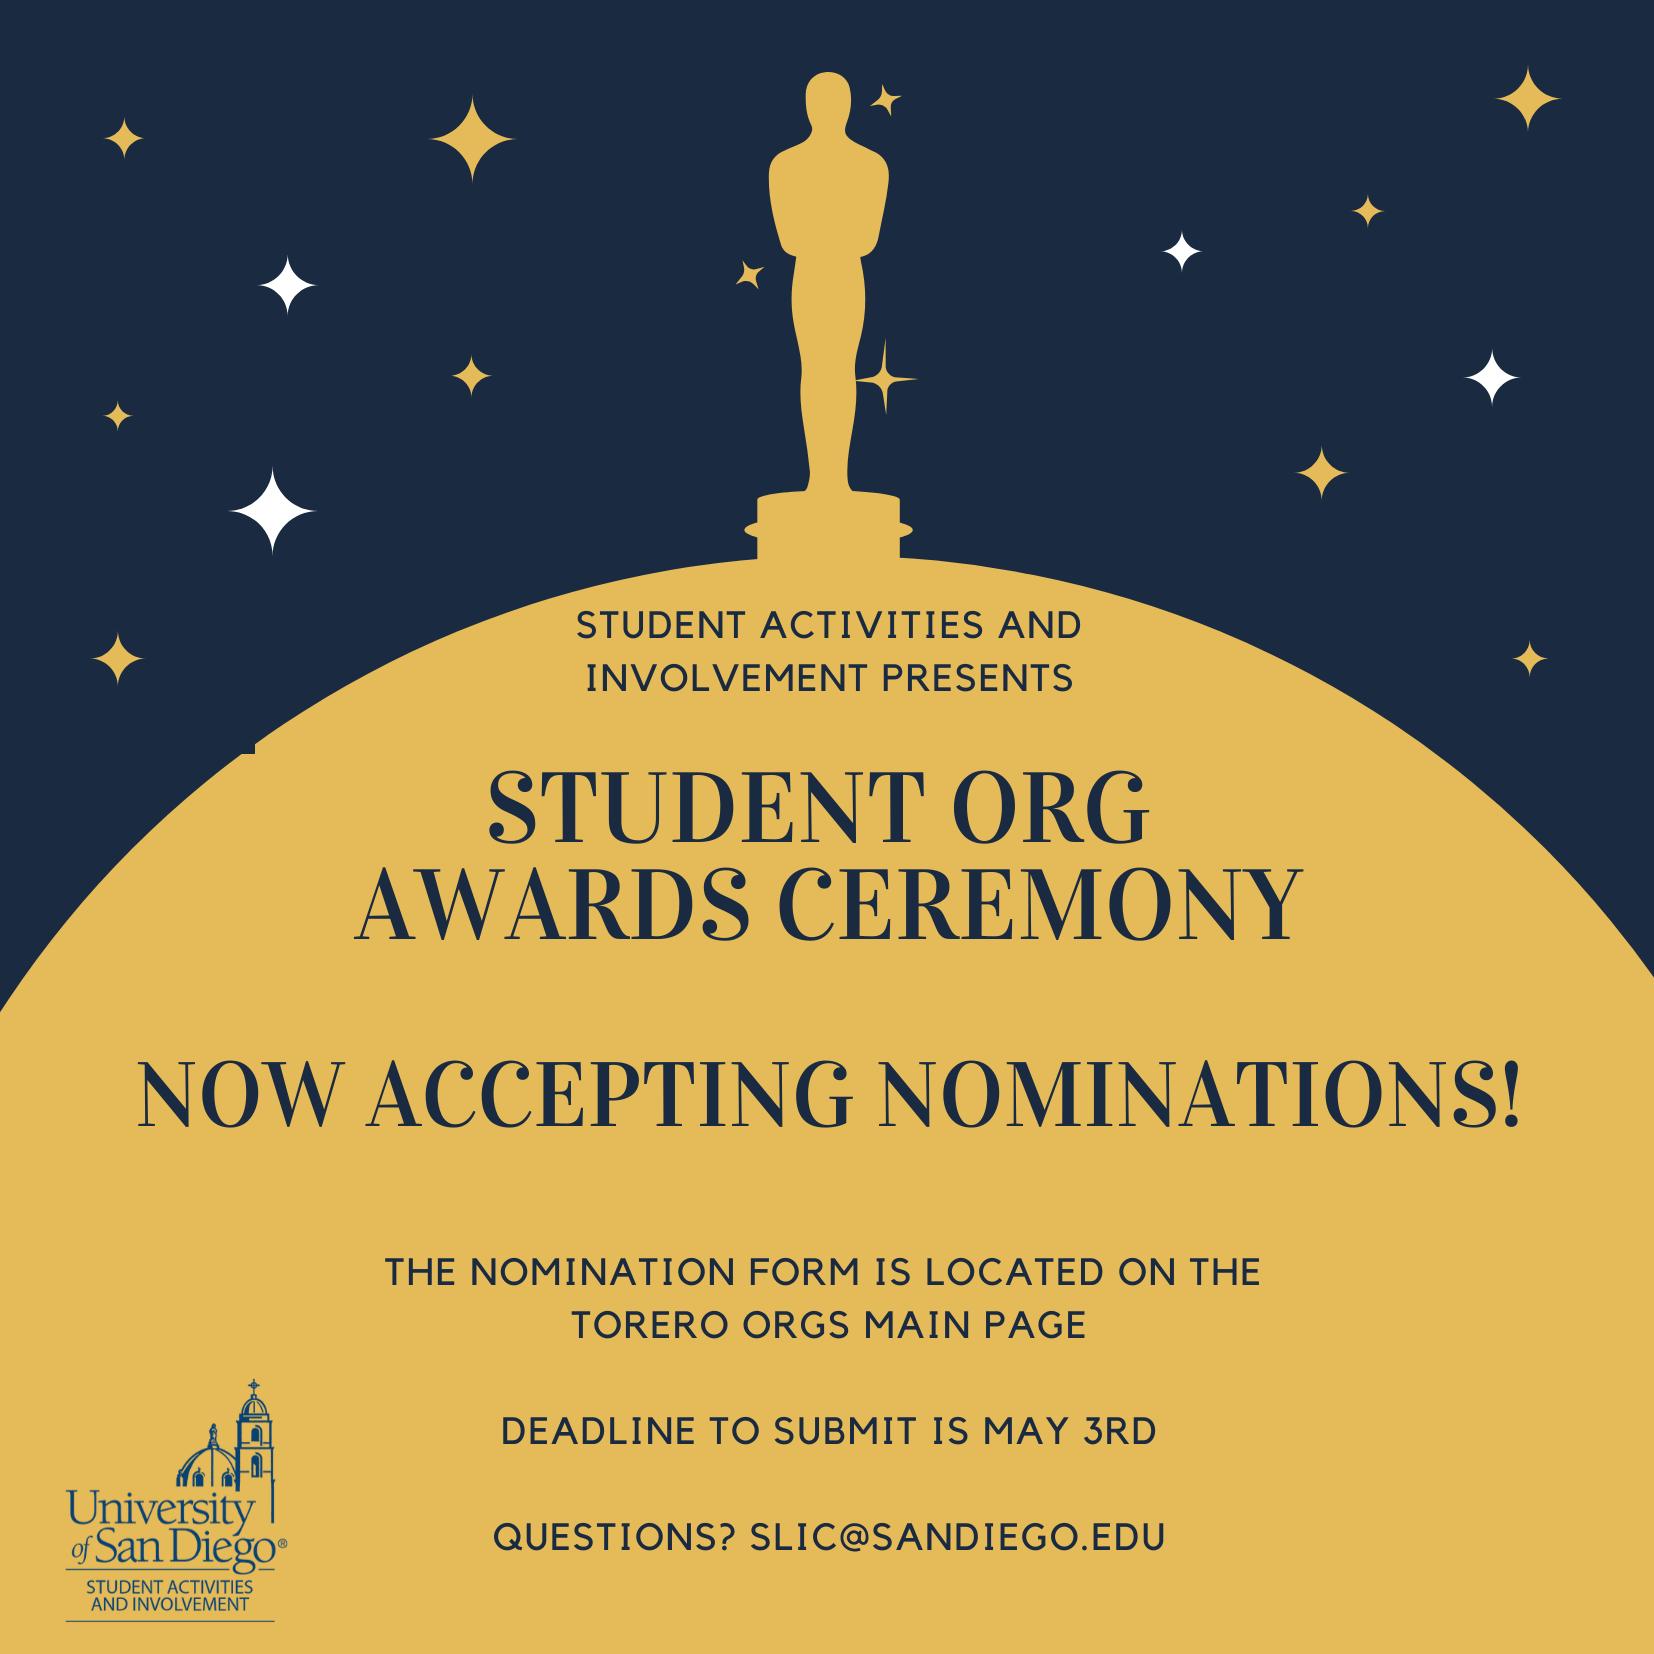 Student Org Awards